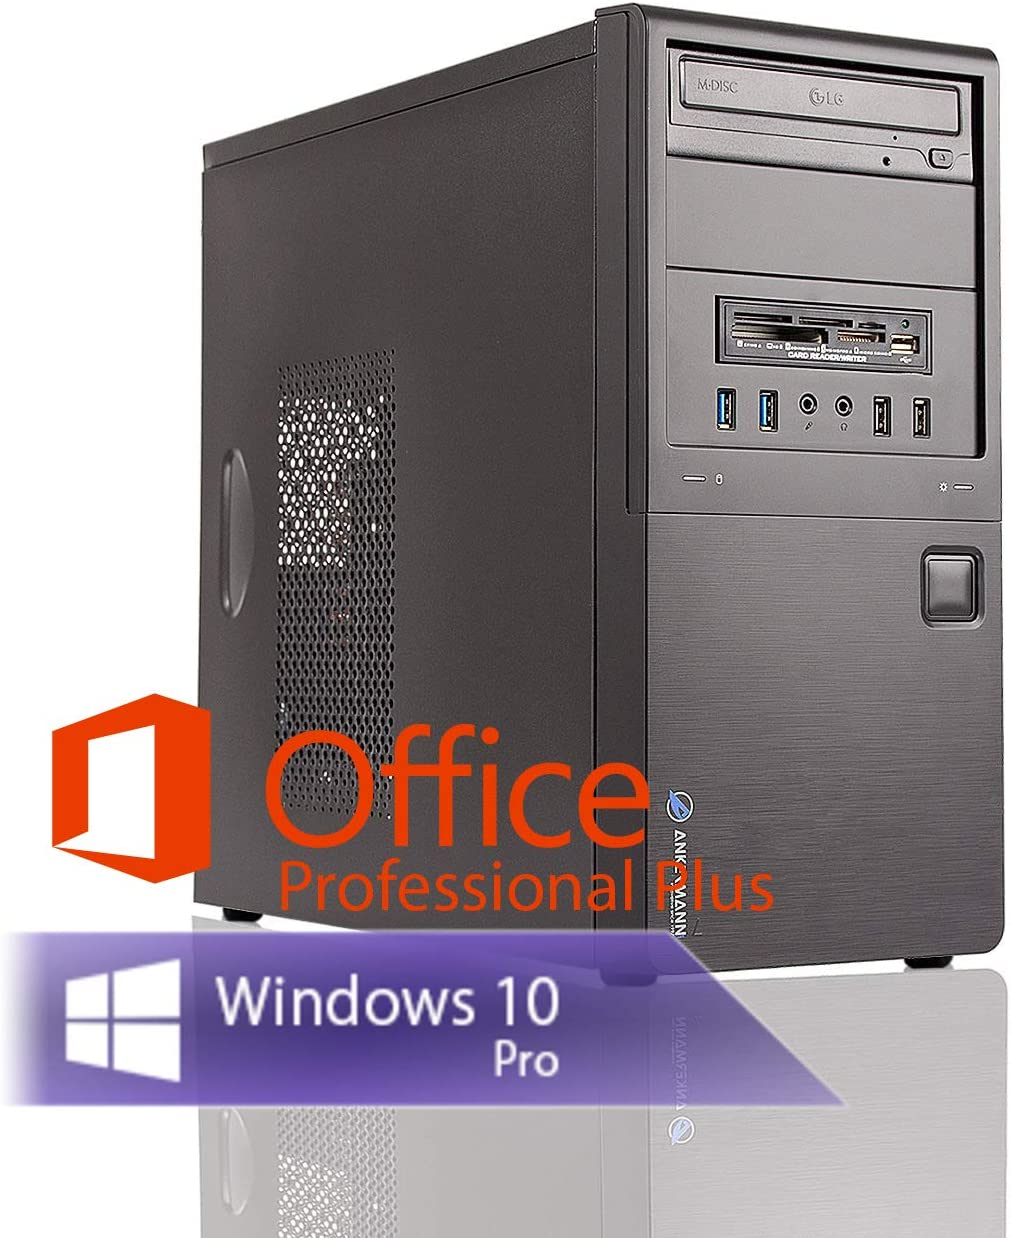 Ankermann Neu Business Office Work PC PC Intel i5 4570 4x3.20GHz NVIDIA GeForce GT 16GB RAM 240GB SSD 1TB HDD Windows 10 Pro W-LAN Office Professional